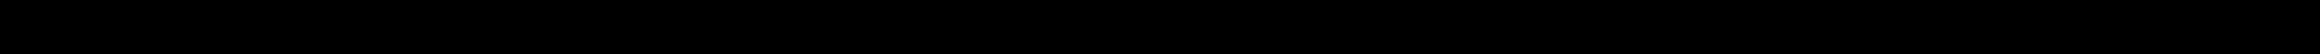 RIDEX 116170406000, 116170406002, 116760406002, 116760469600, 116760469601 Φίλτρο καυσίμου